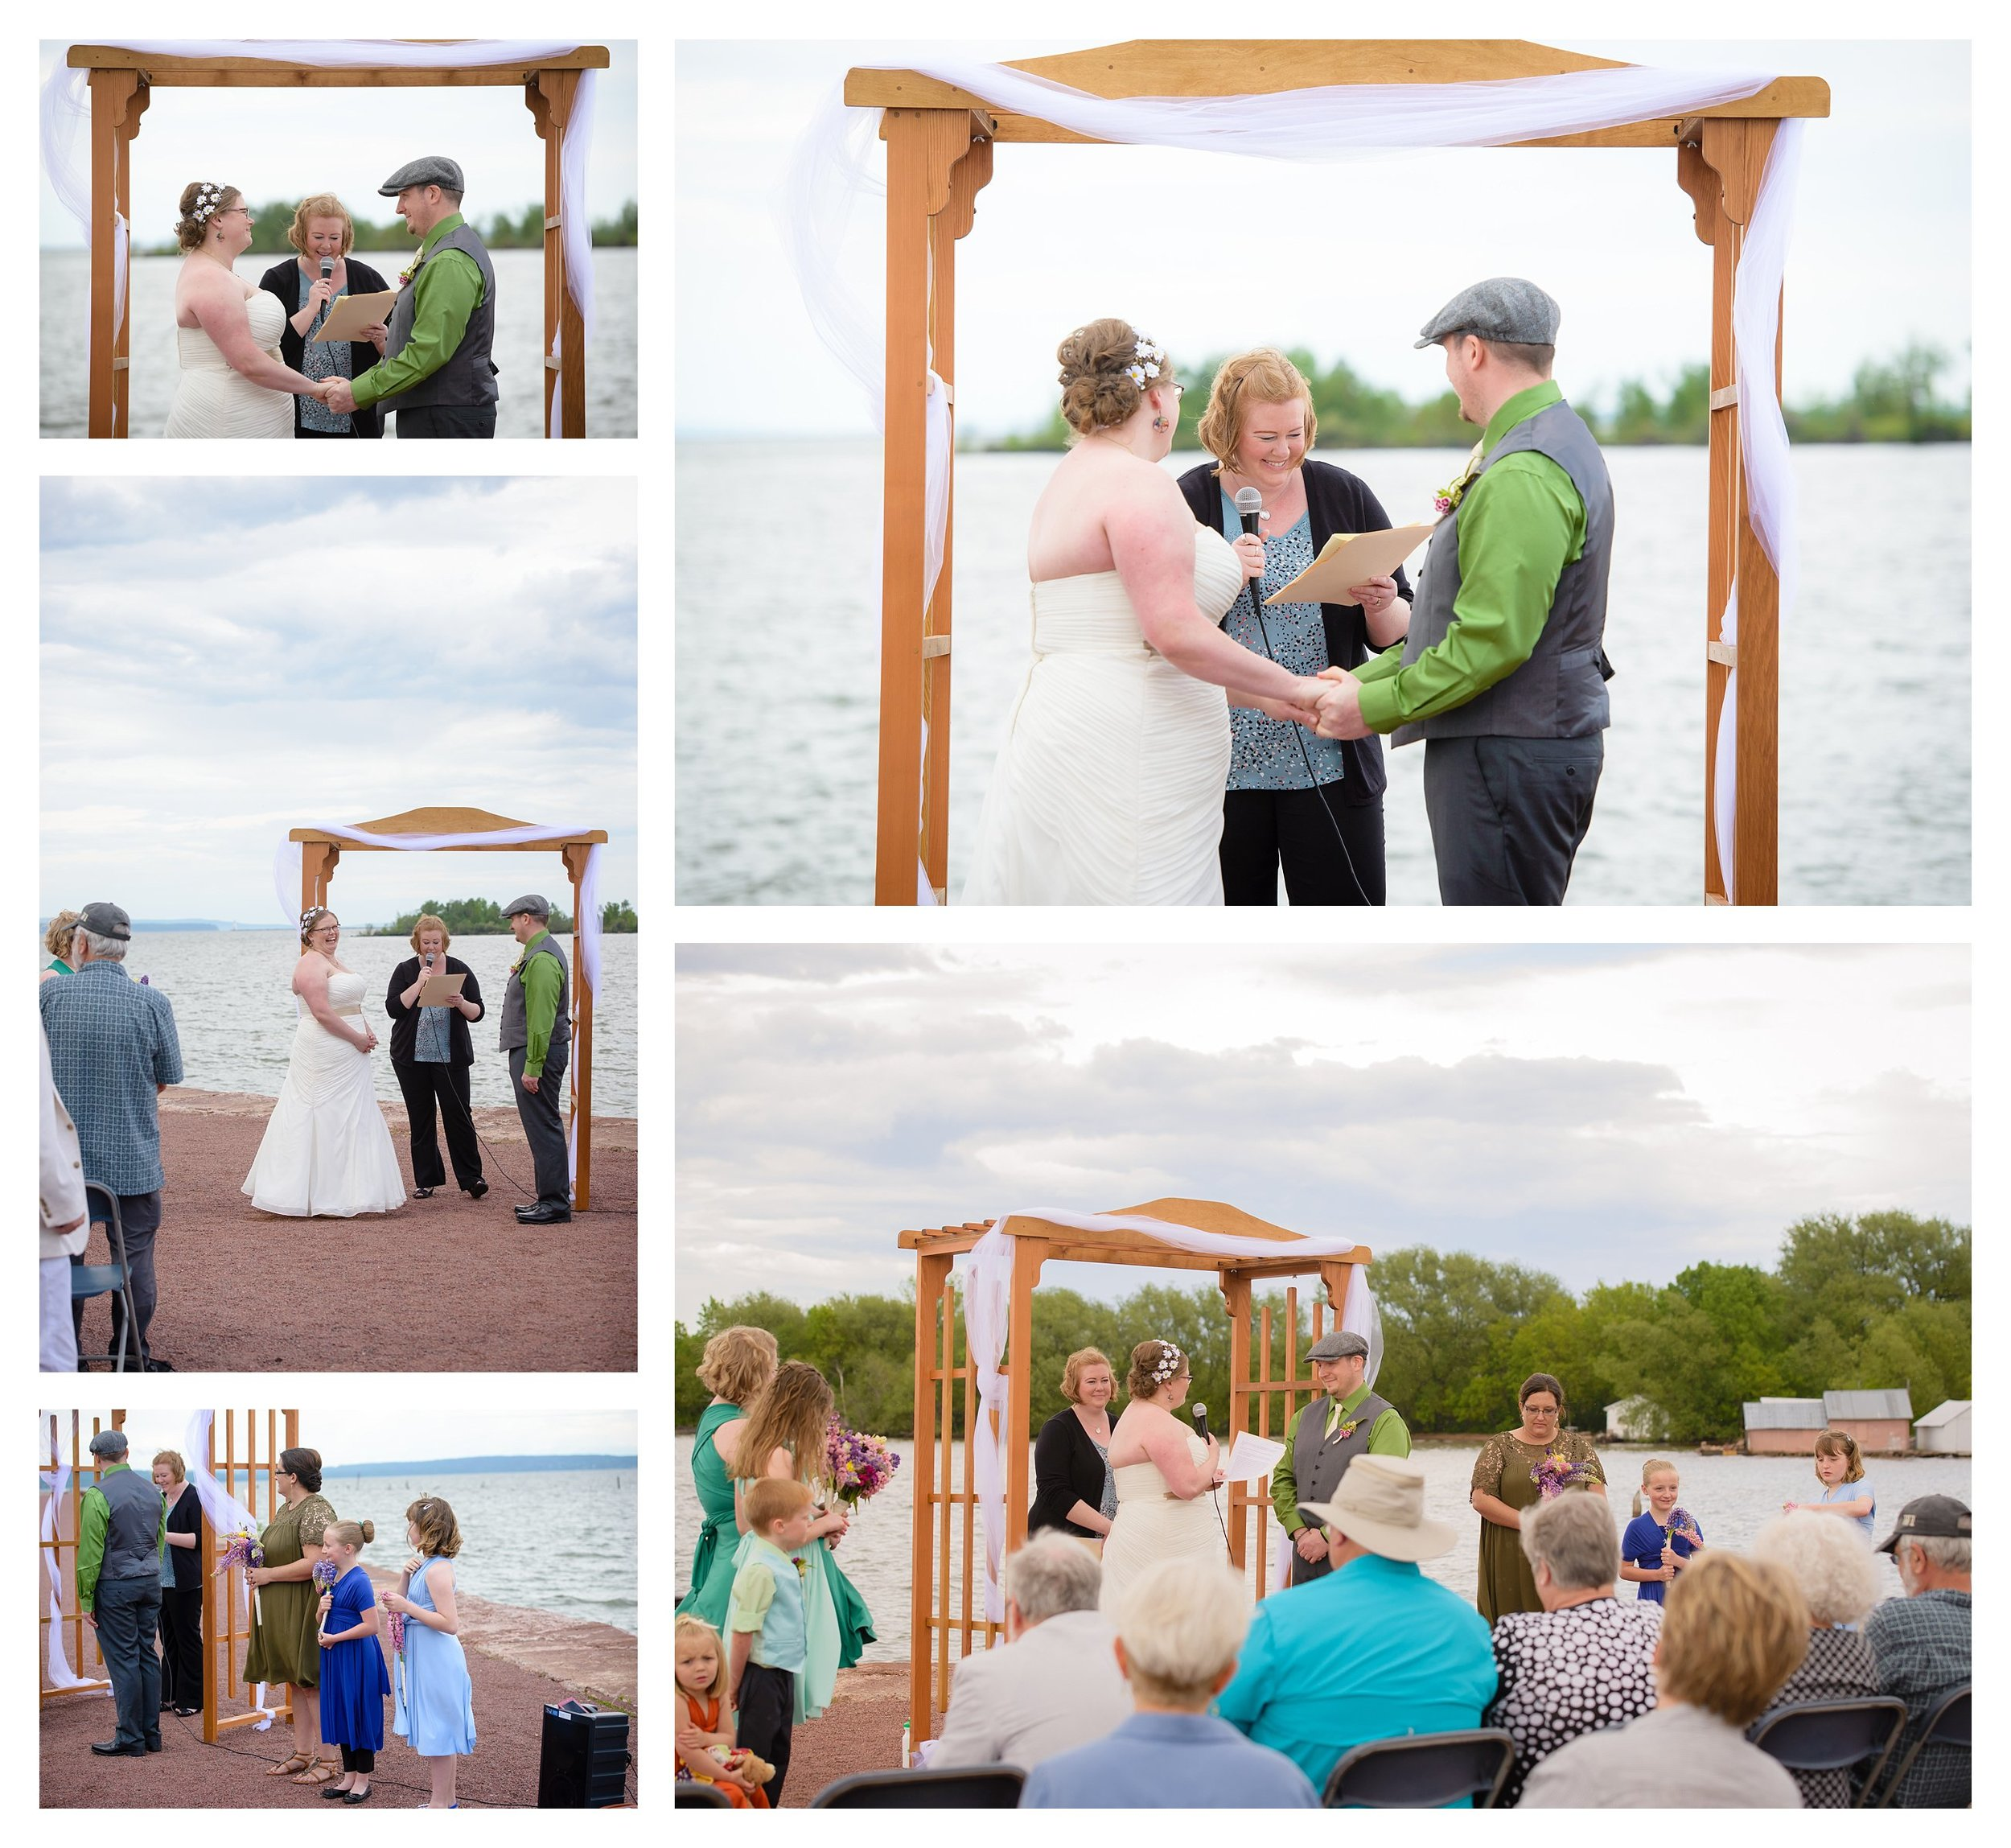 ashland oredock northwoods wisconsin wedding ps 139 photography_0284.jpg